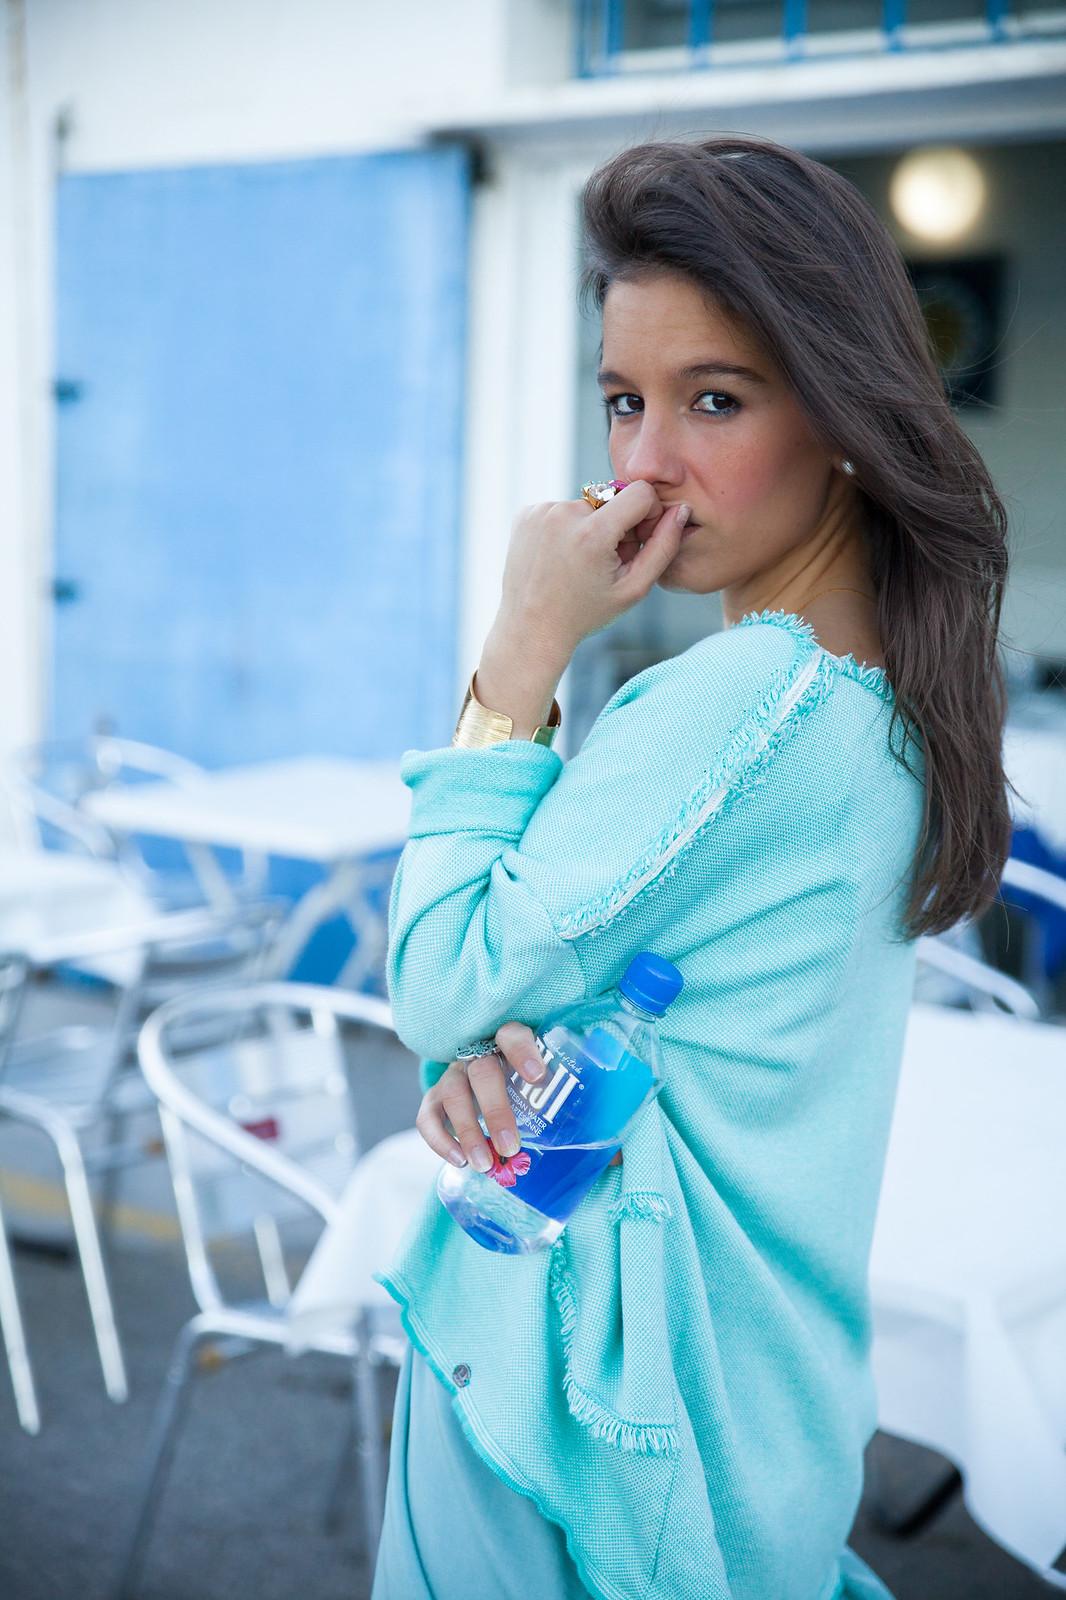 cómo combinar una prenda turquesa jersey de rüga y satin dress de na-kd theguestgirl look turquesa fiji water barcelona influencer spain